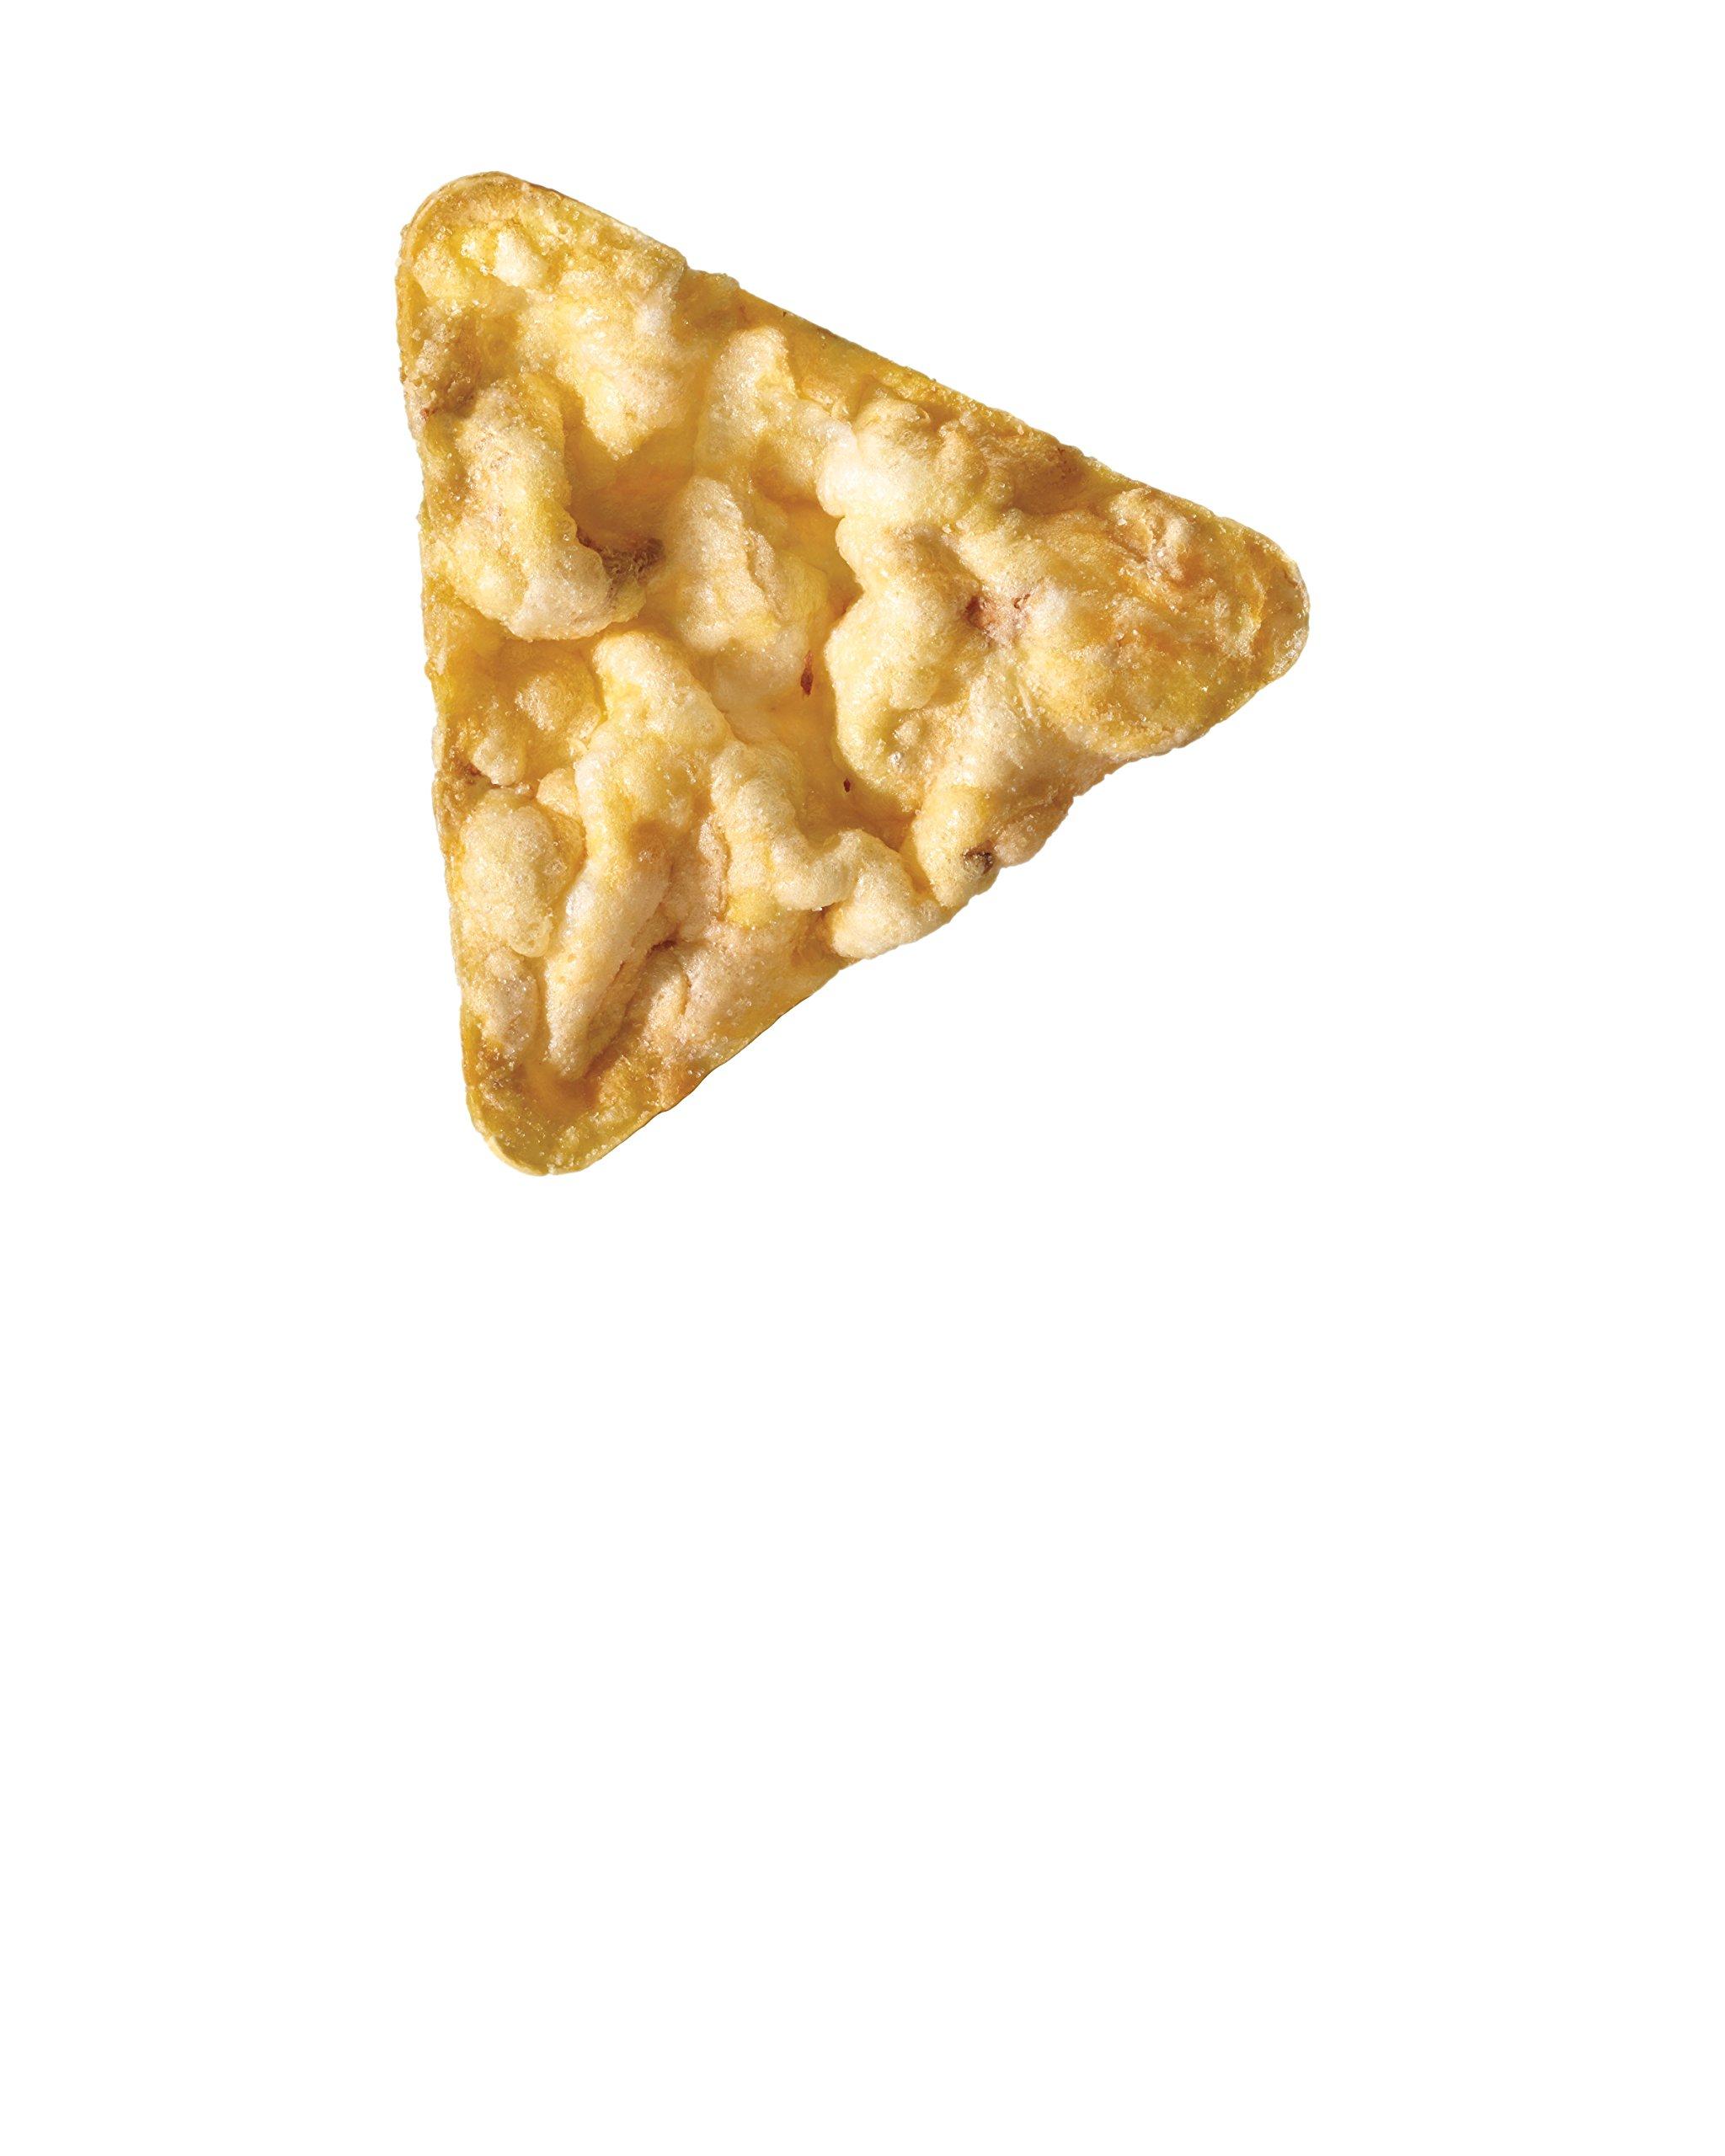 PopCorners Sea Salt Snack Pack   Gluten Free, Vegan Snack   (40 Pack, 1 oz Snack Bags) by Popcorners (Image #4)